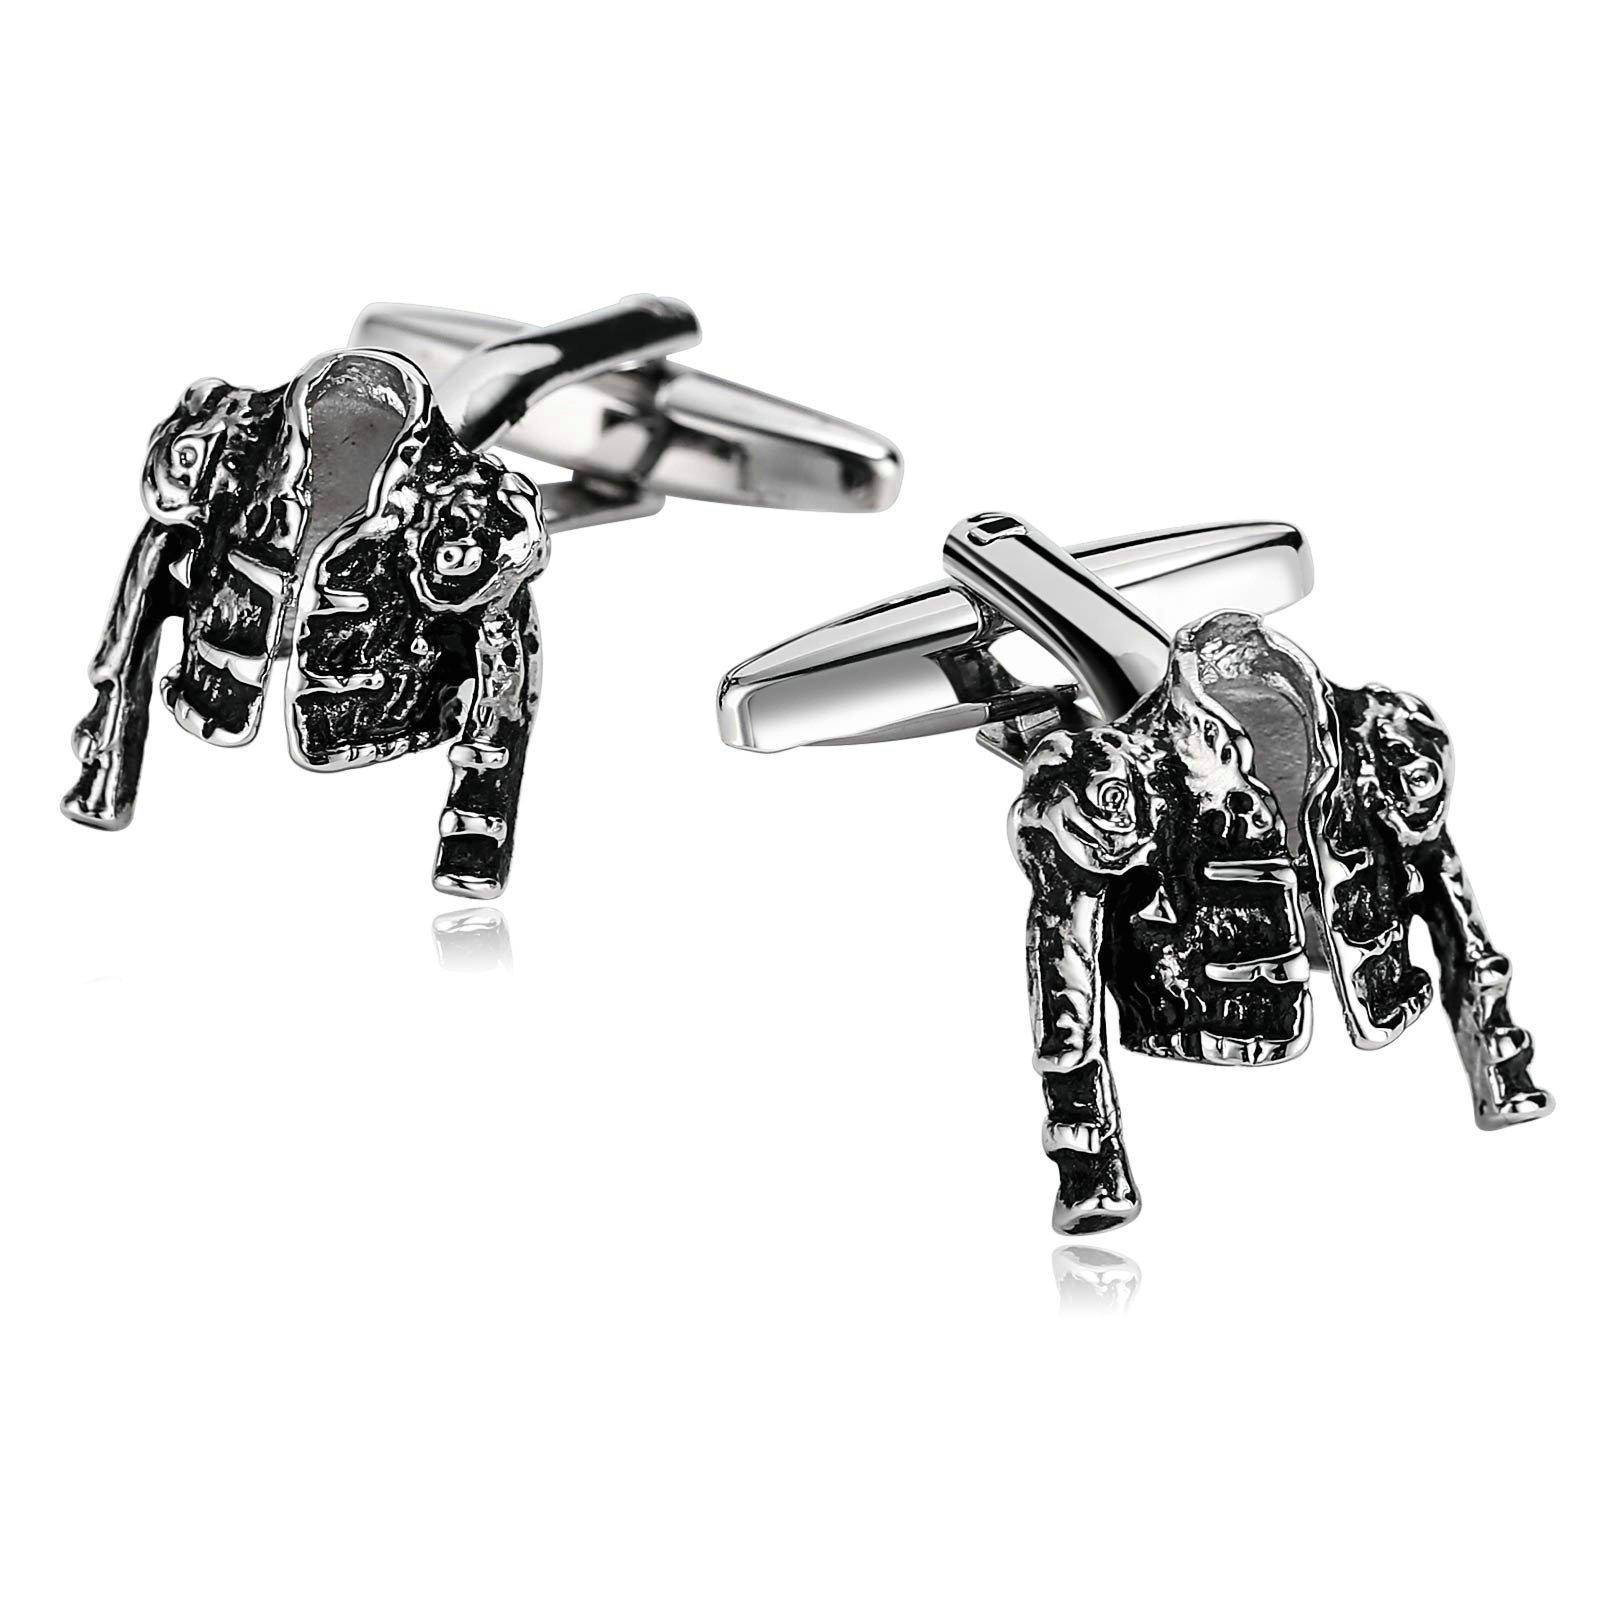 Adisaer Stainless Steel Cuff links for Men Silver Black Jacket Vest Business Gift Dress Shirt Cufflinks